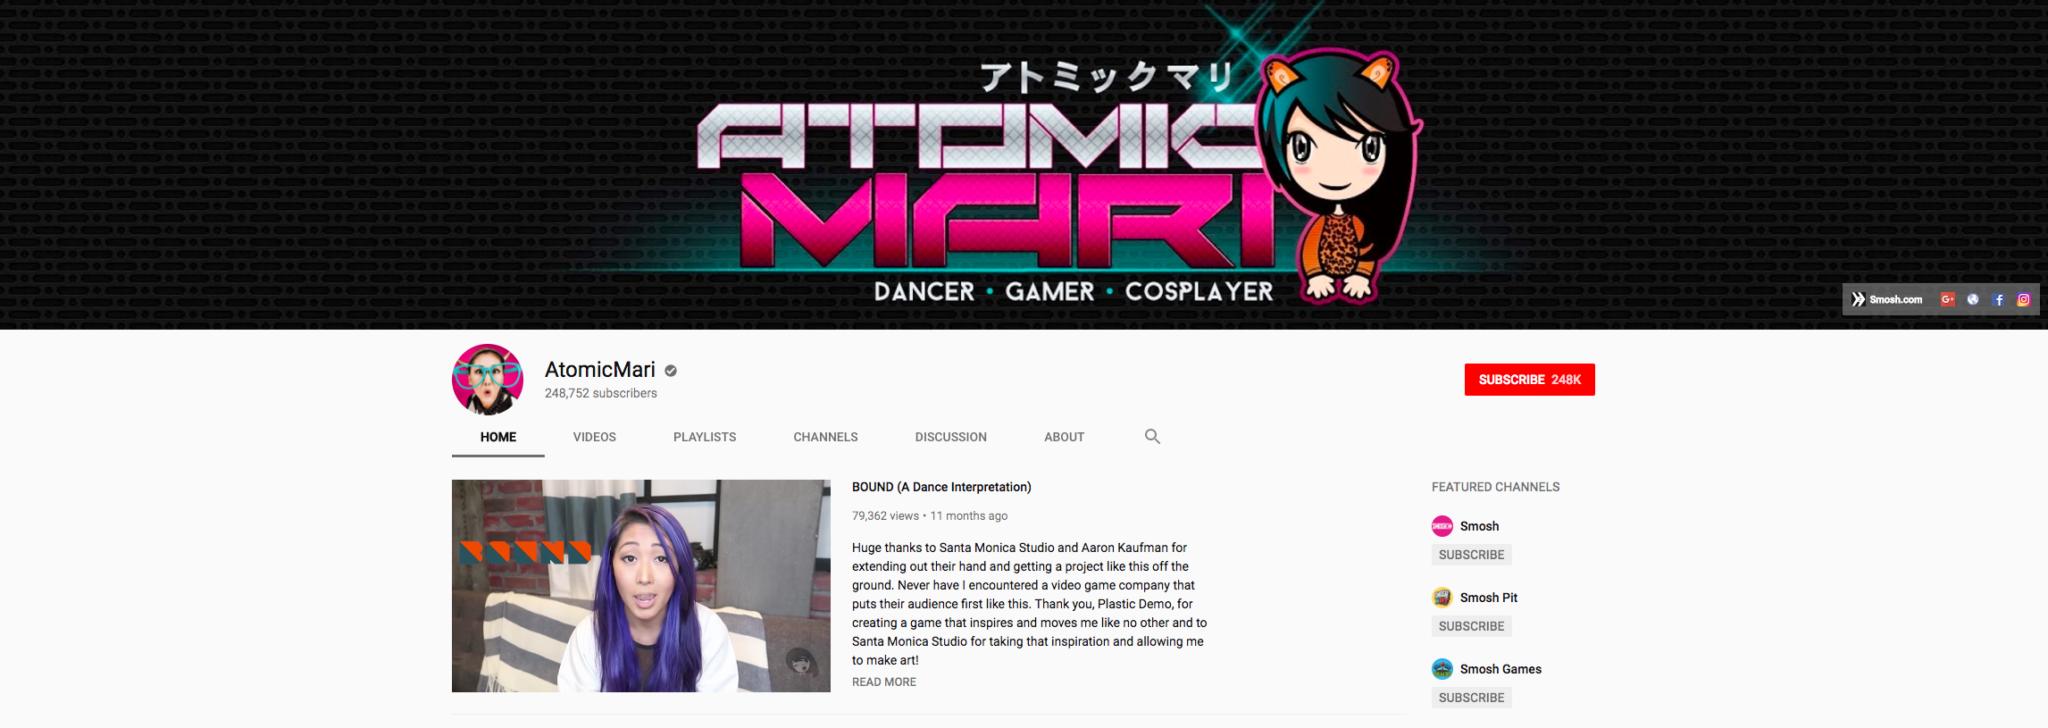 AtomicMari Top Gaming Influencer